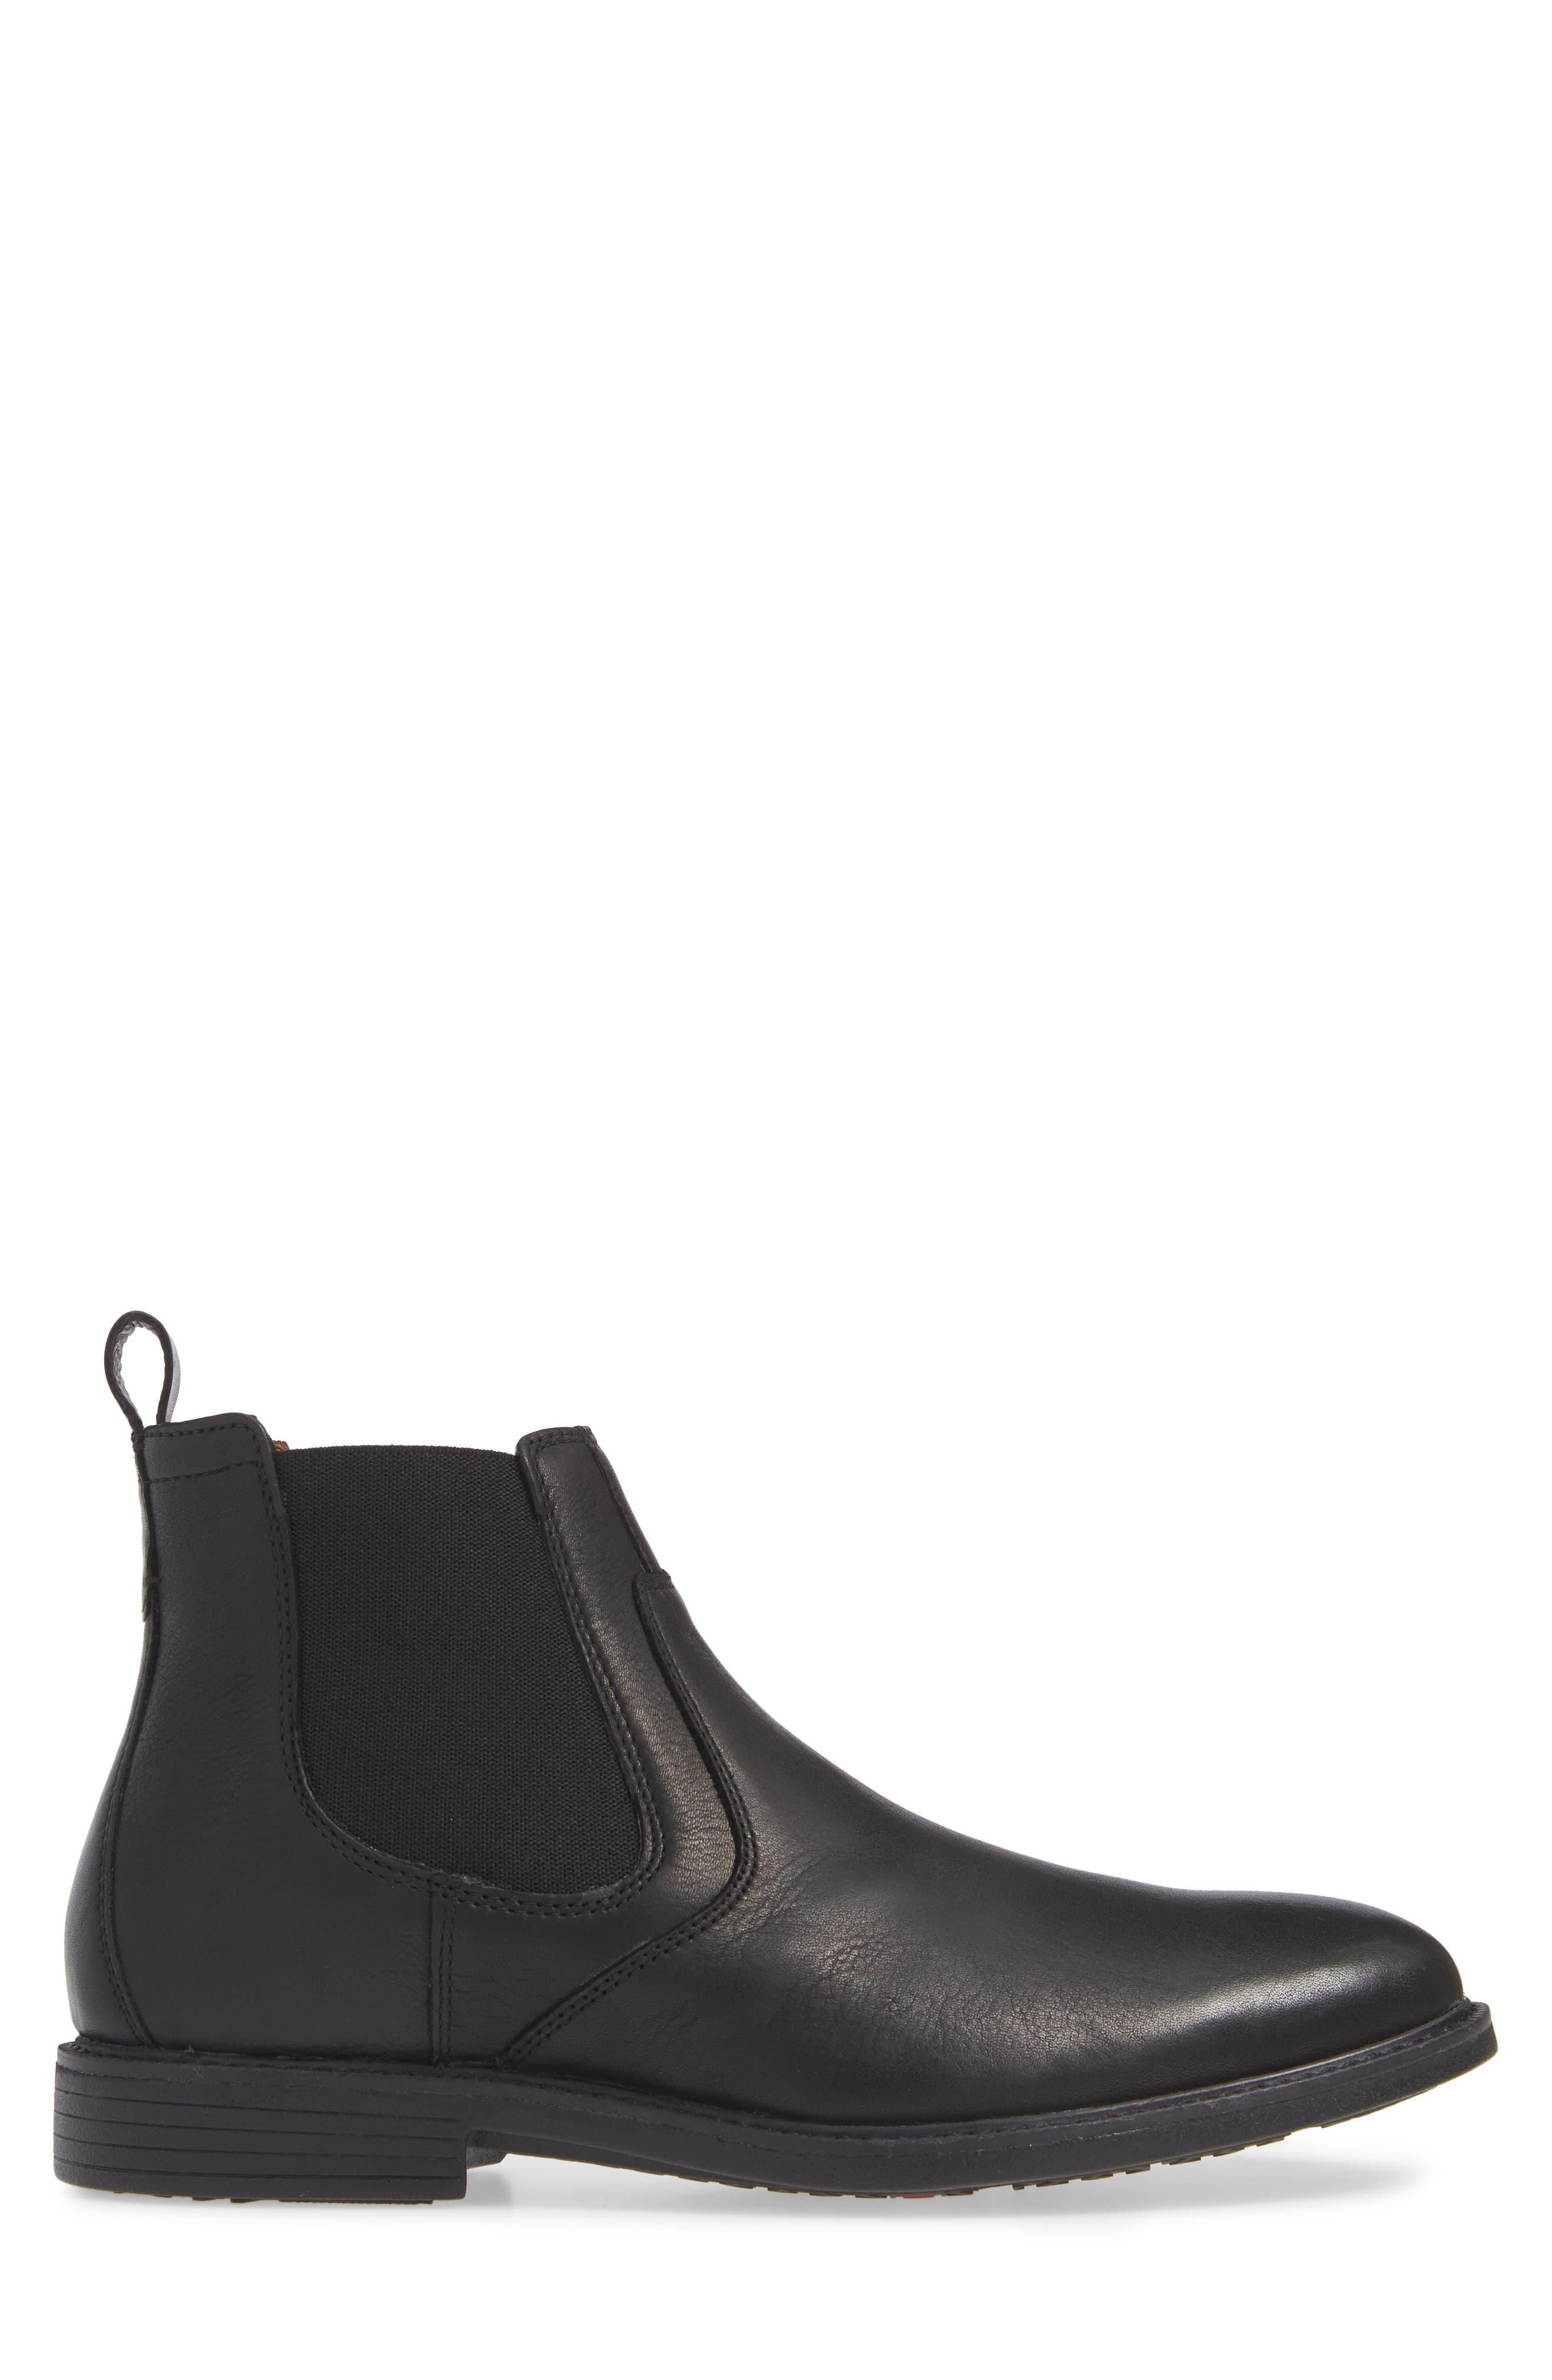 Hollis Waterproof Chelsea Boot,                             Alternate thumbnail 3, color,                             BLACK LEATHER